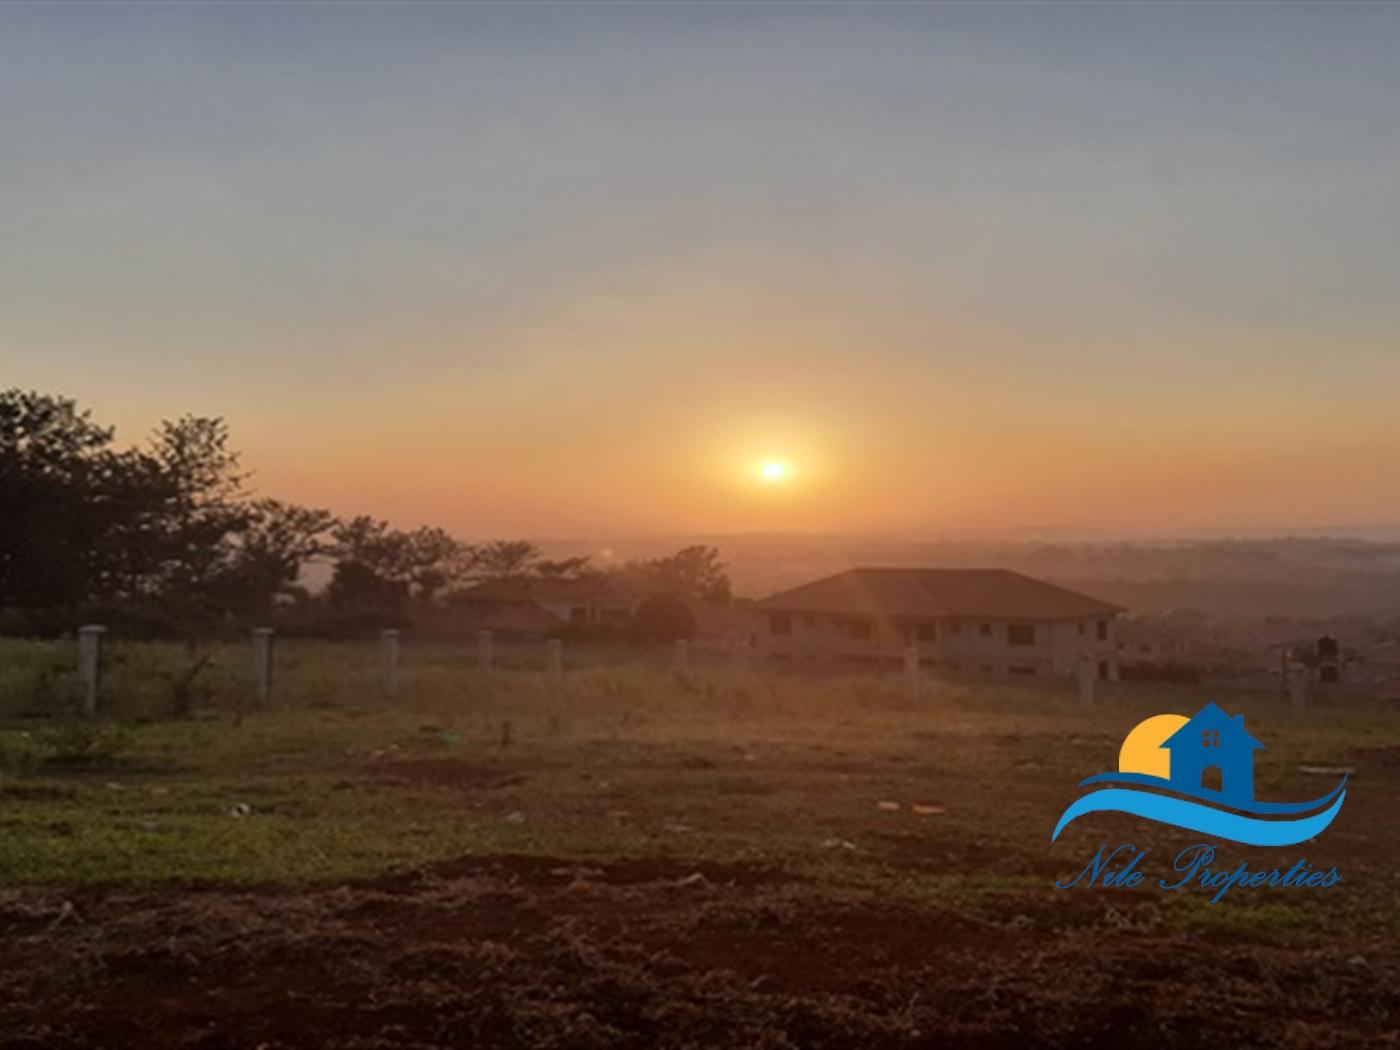 Multi Purpose Land for sale in Jinja Jinja